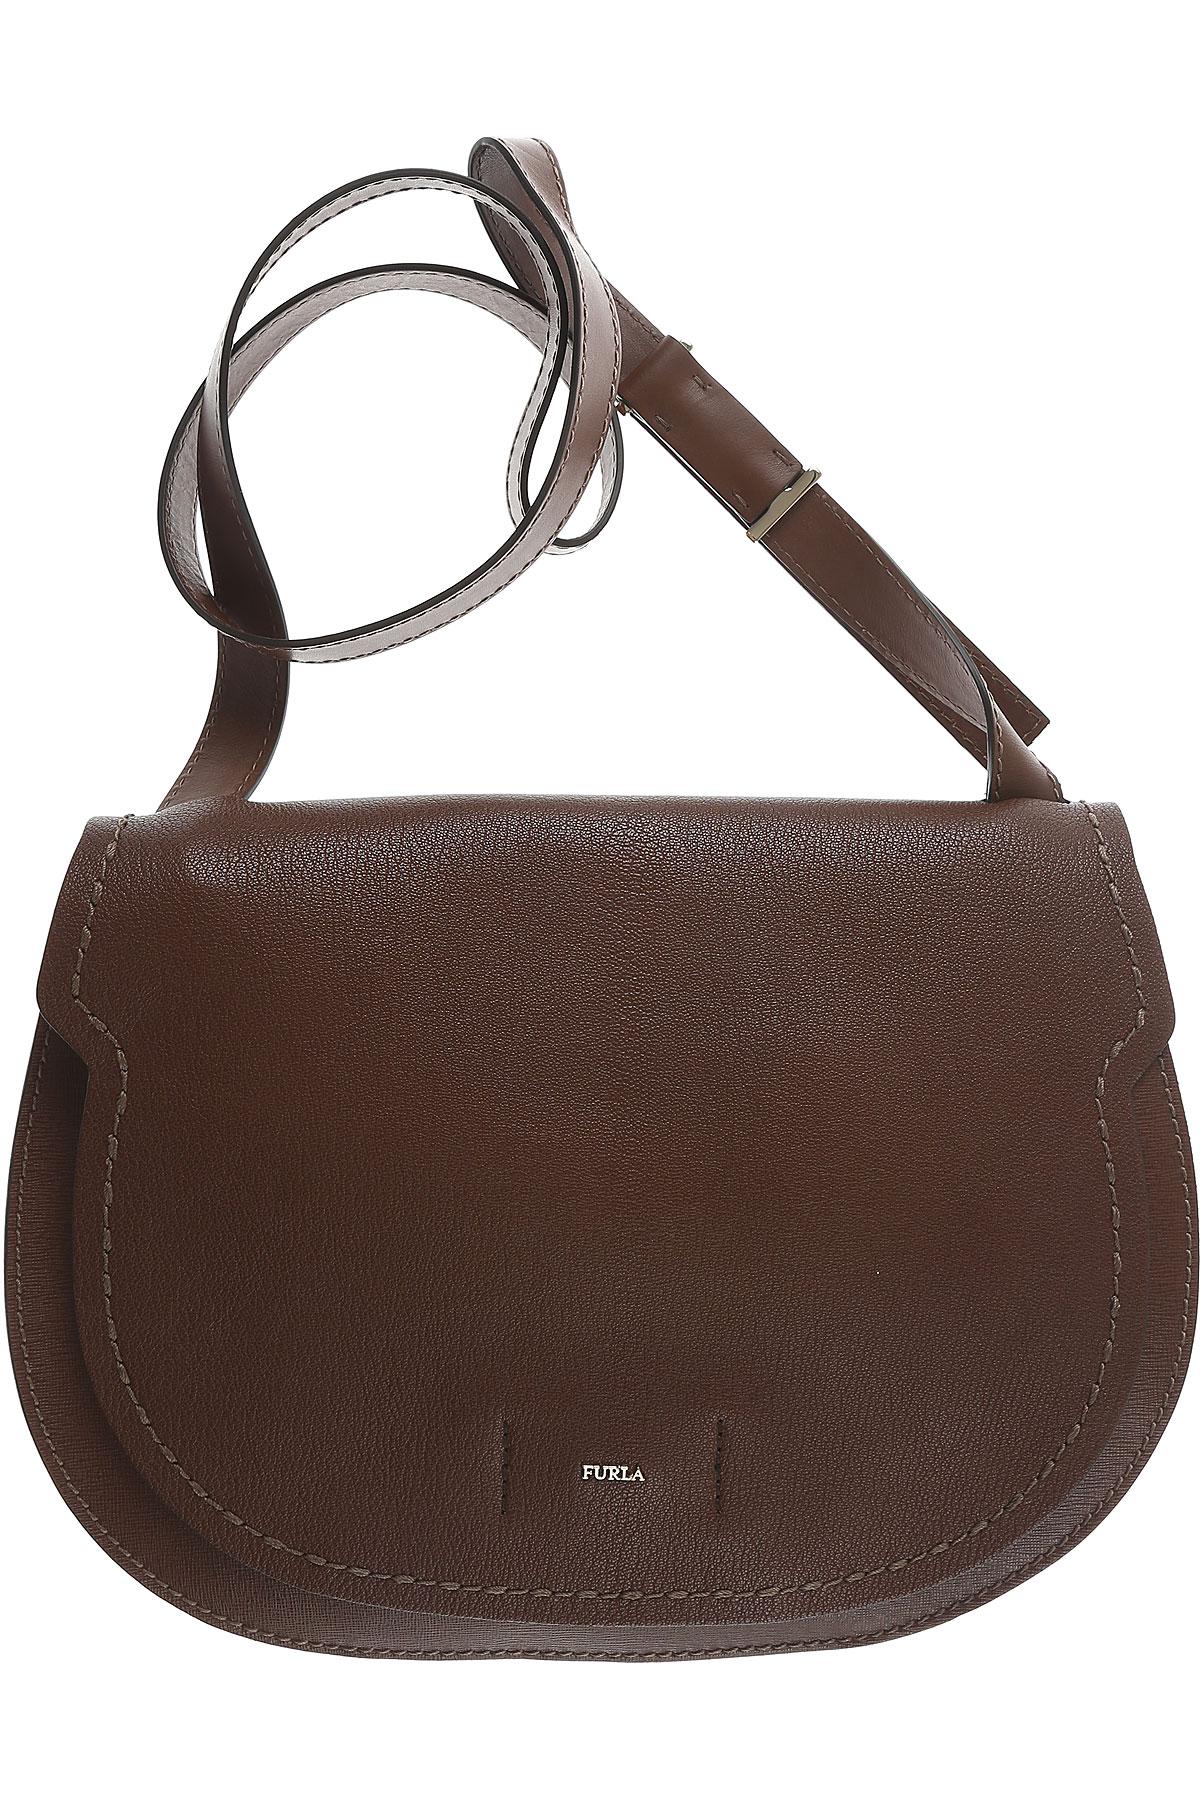 Furla Shoulder Bag for Women On Sale in Outlet, Marron Glac�, Leather, 2017